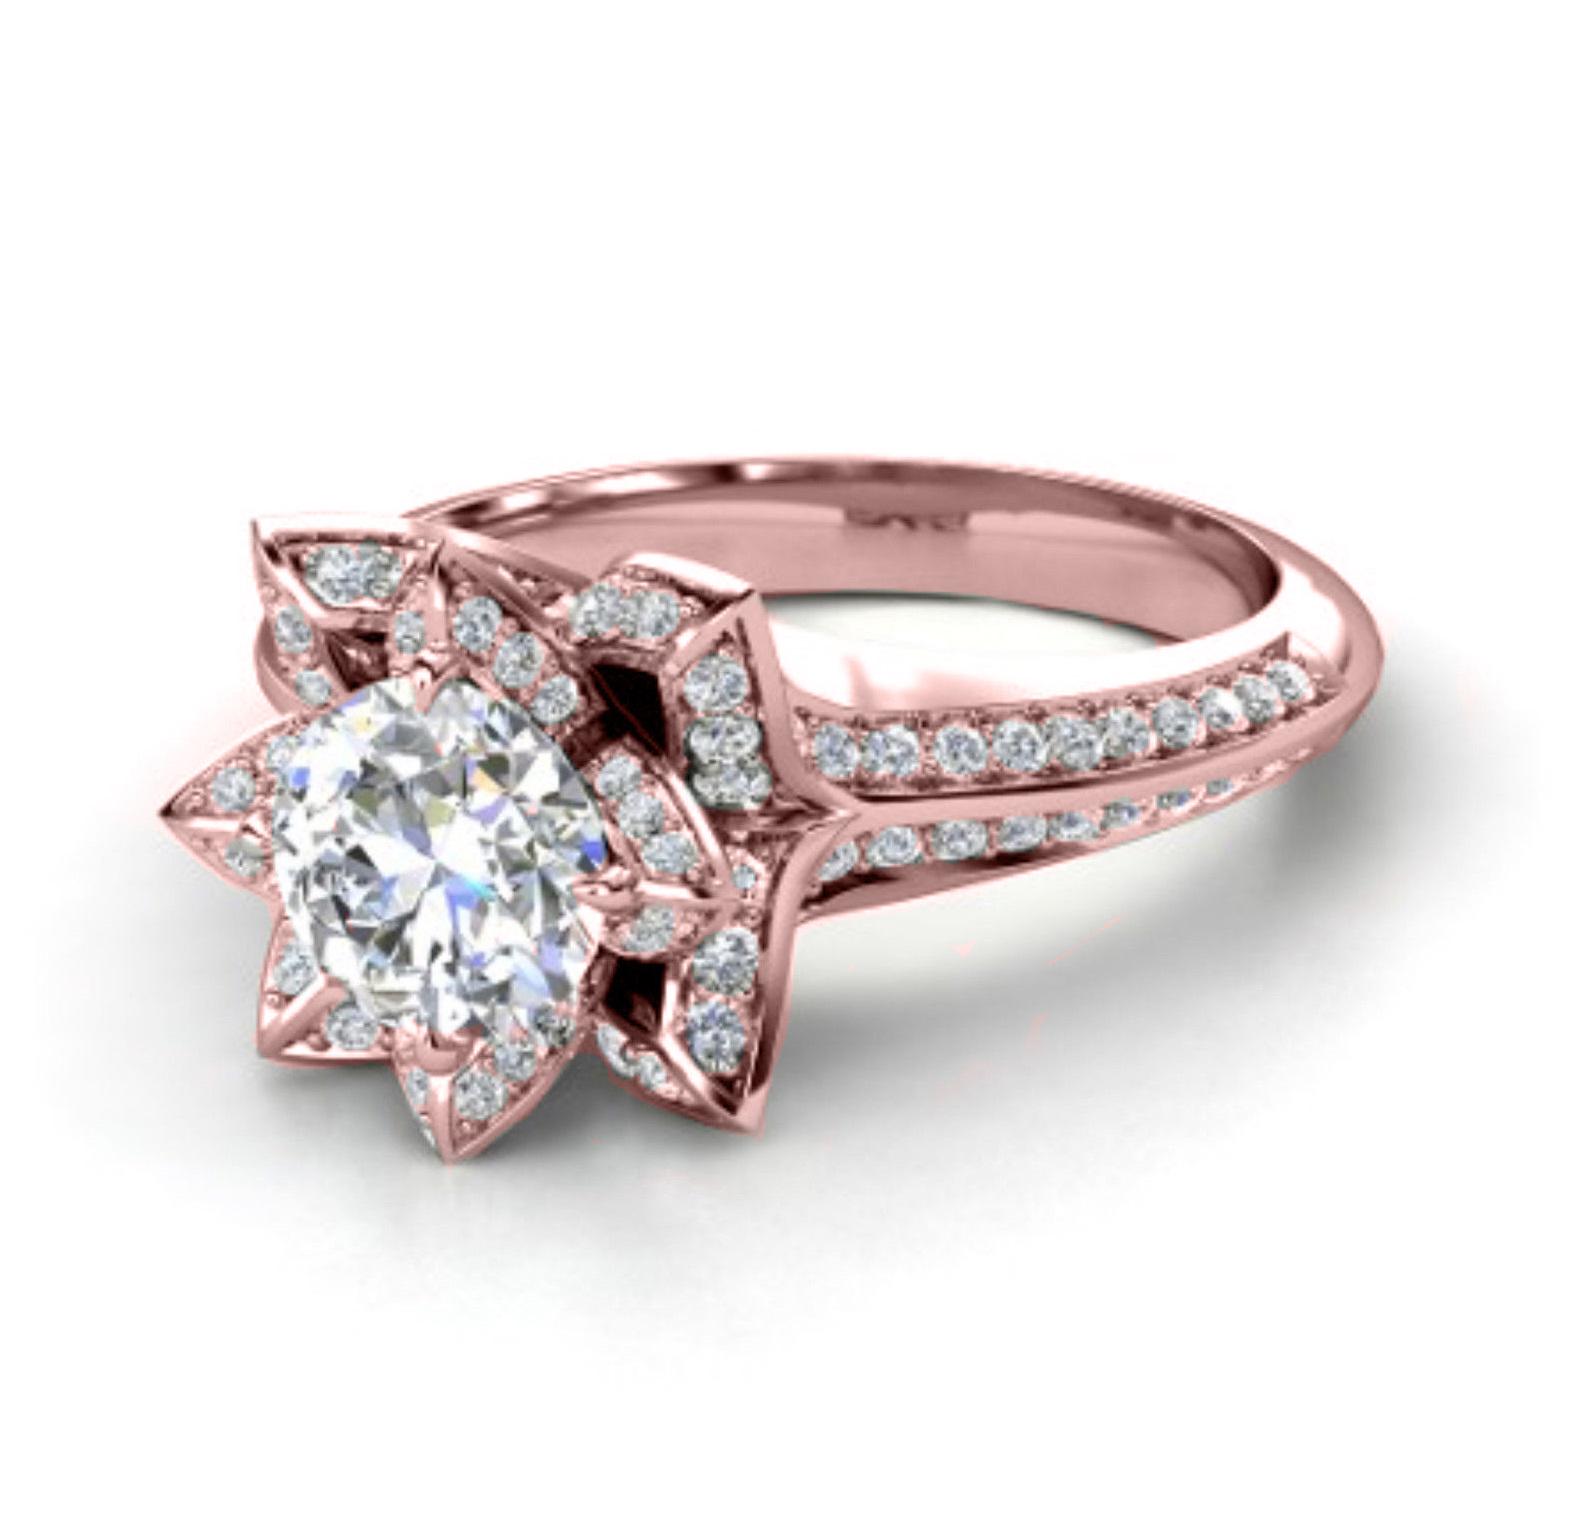 'Aspen' 2.10ct Flower White, Yellow or Rose Engagement Ring